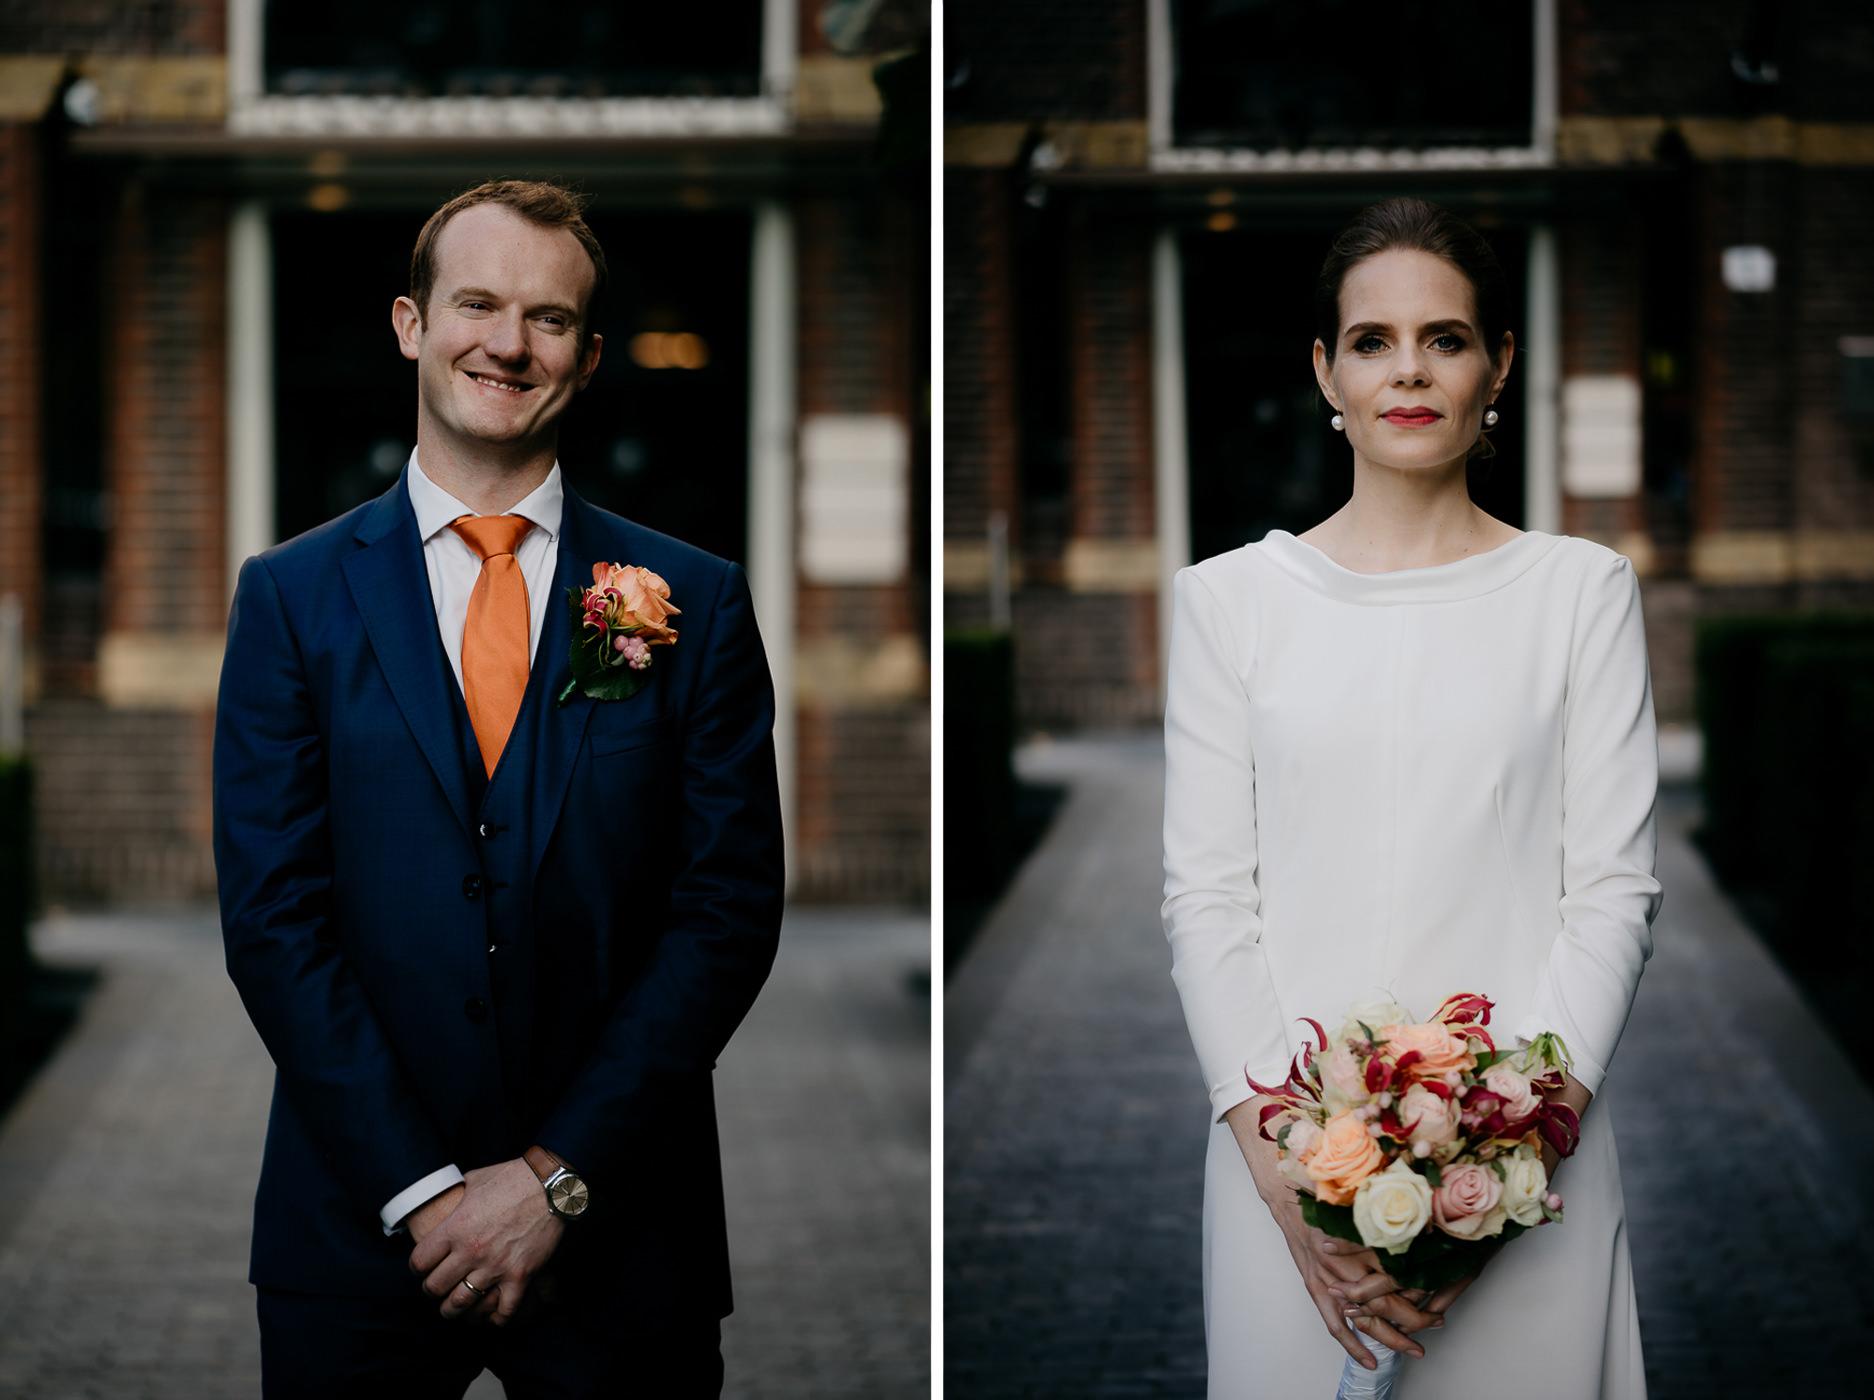 bruidsfotografie-trouwfotograaf-wedding-photographer-amsterdam-James-Jantine-290 copy.jpg